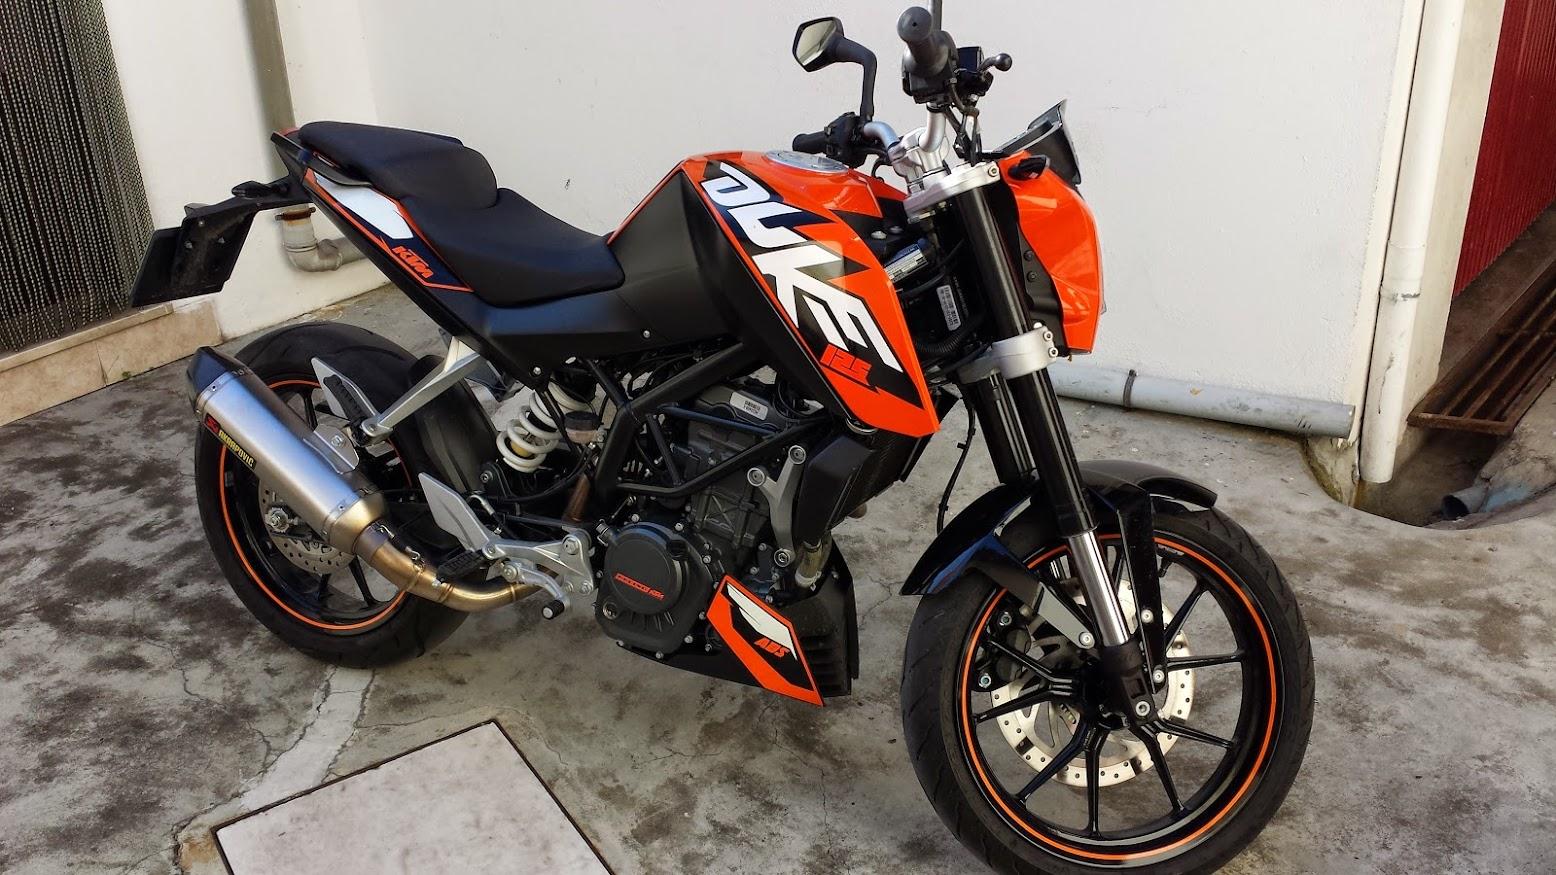 KTM Duke 125 ABS - Leiria - Página 2 20140429_171119